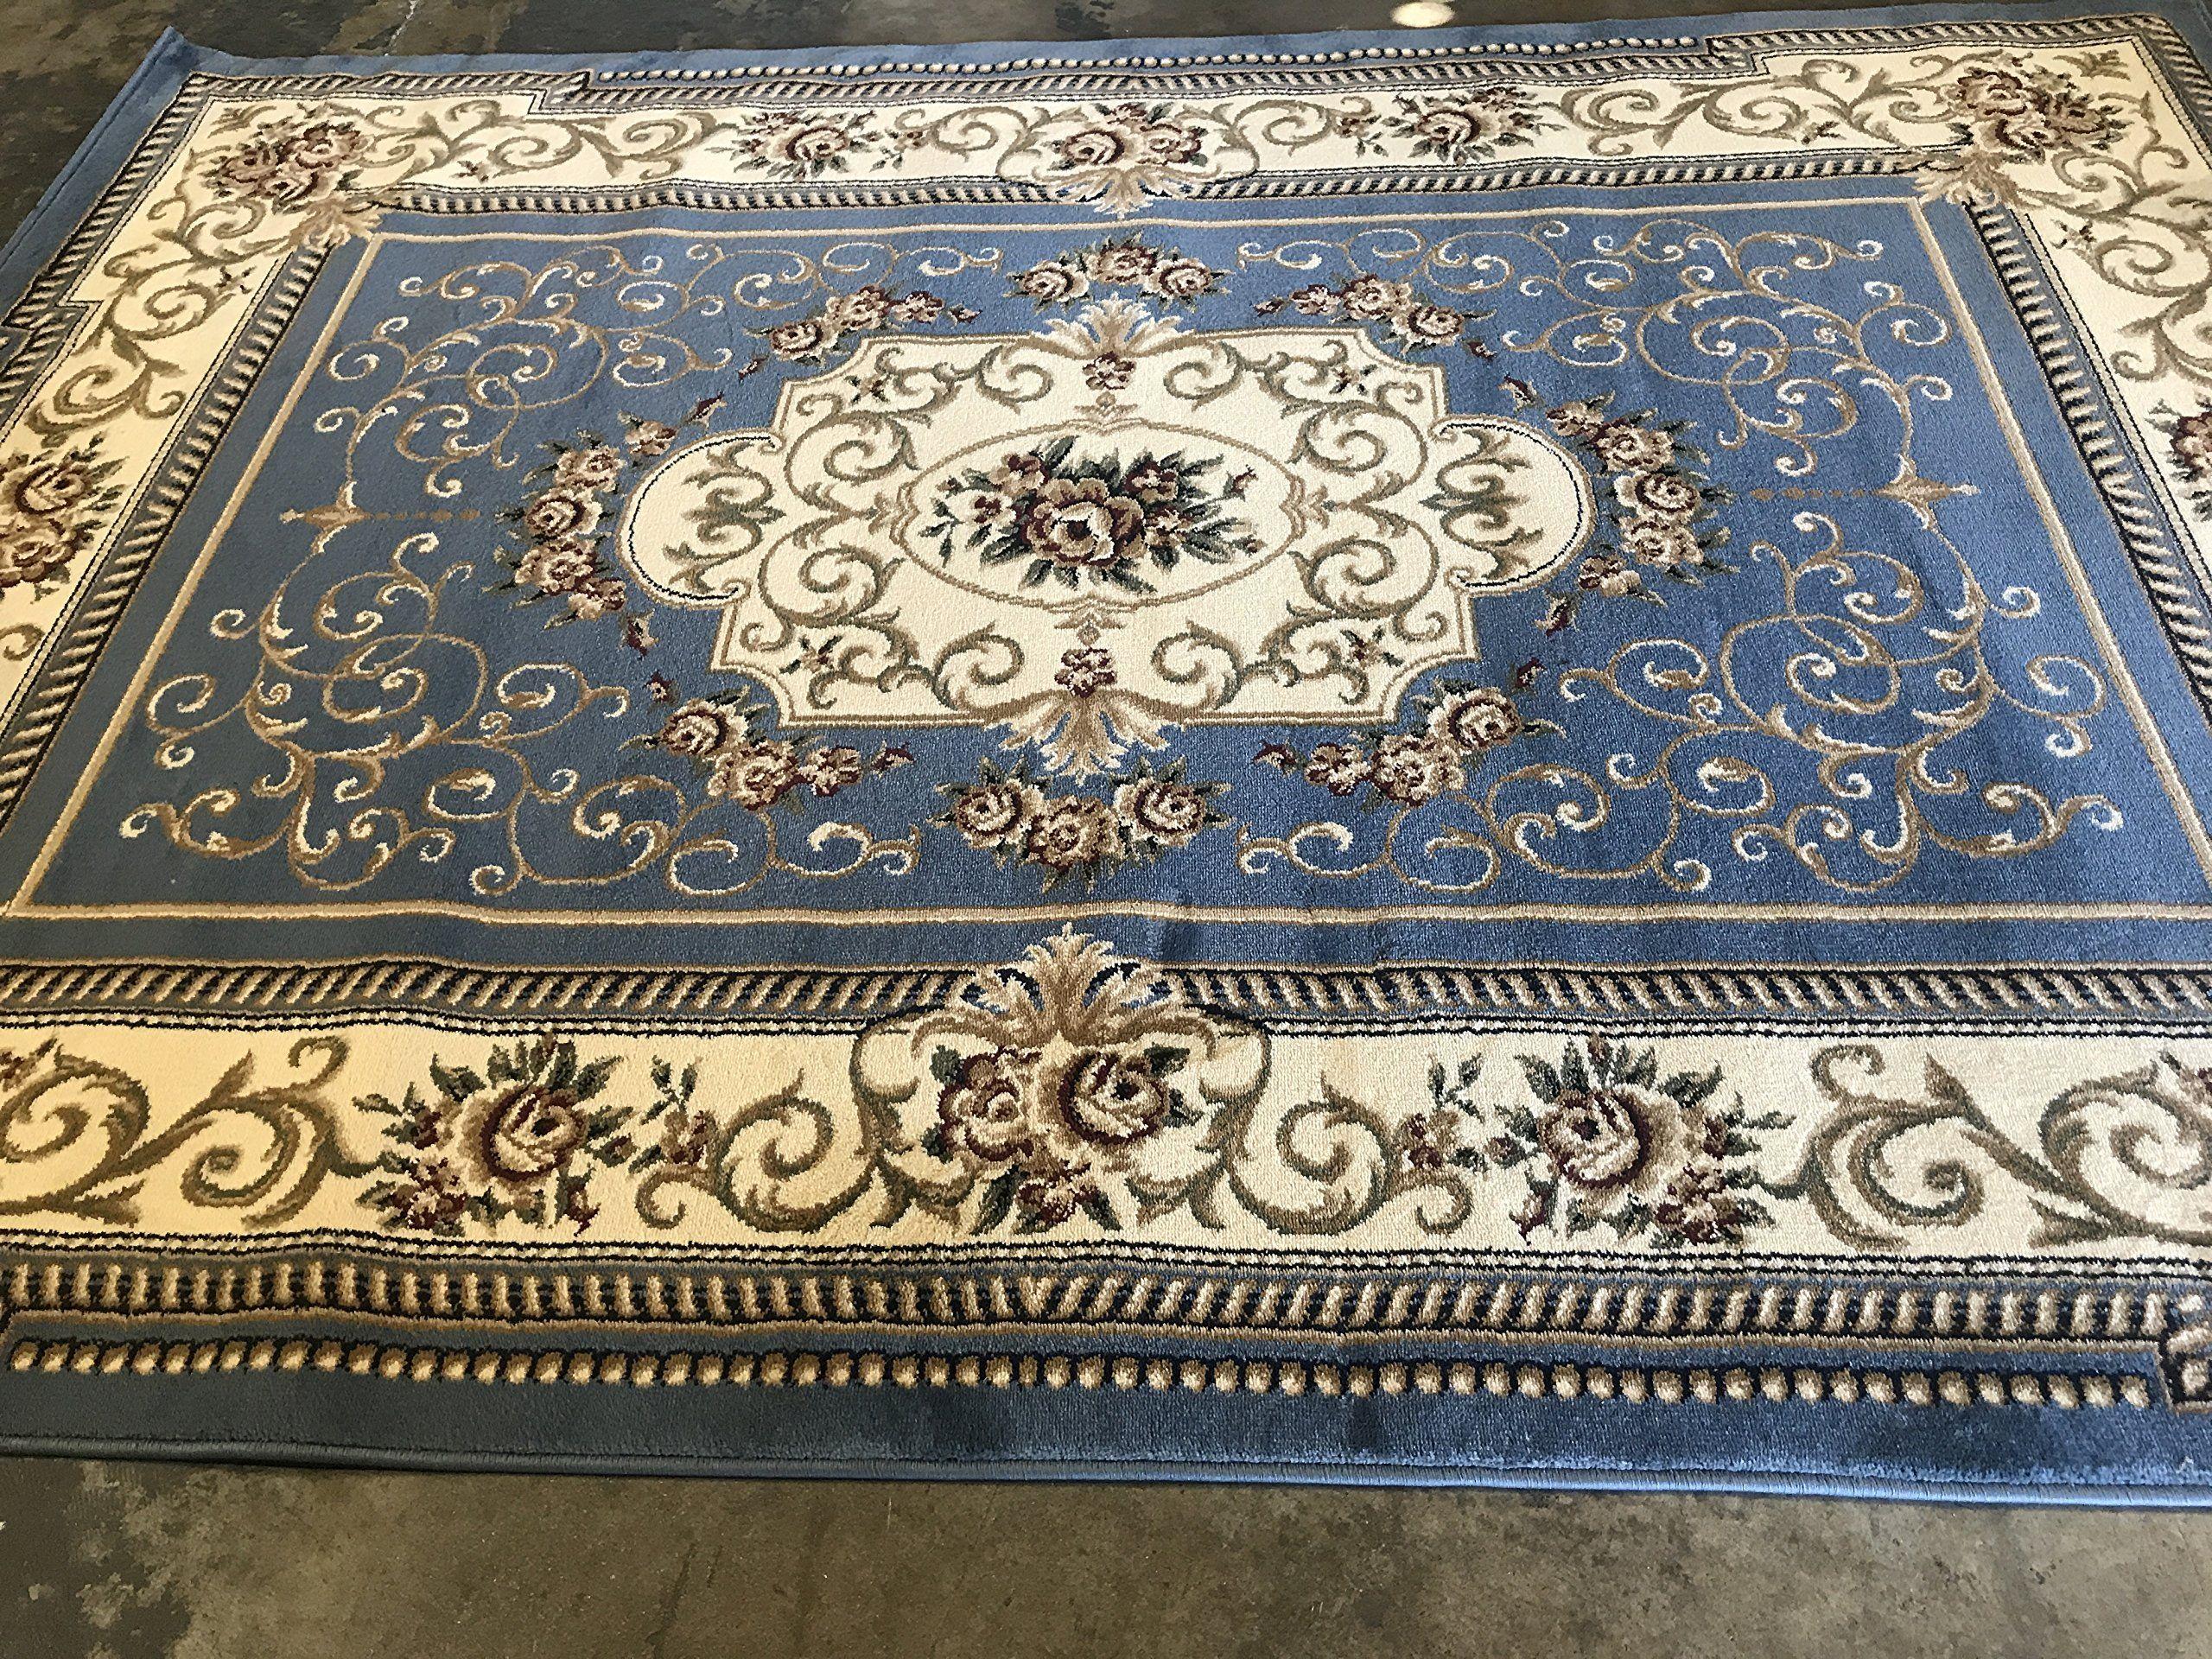 Traditional Persian Area Rug 330000 Point Deir Debwan Blue 616 5